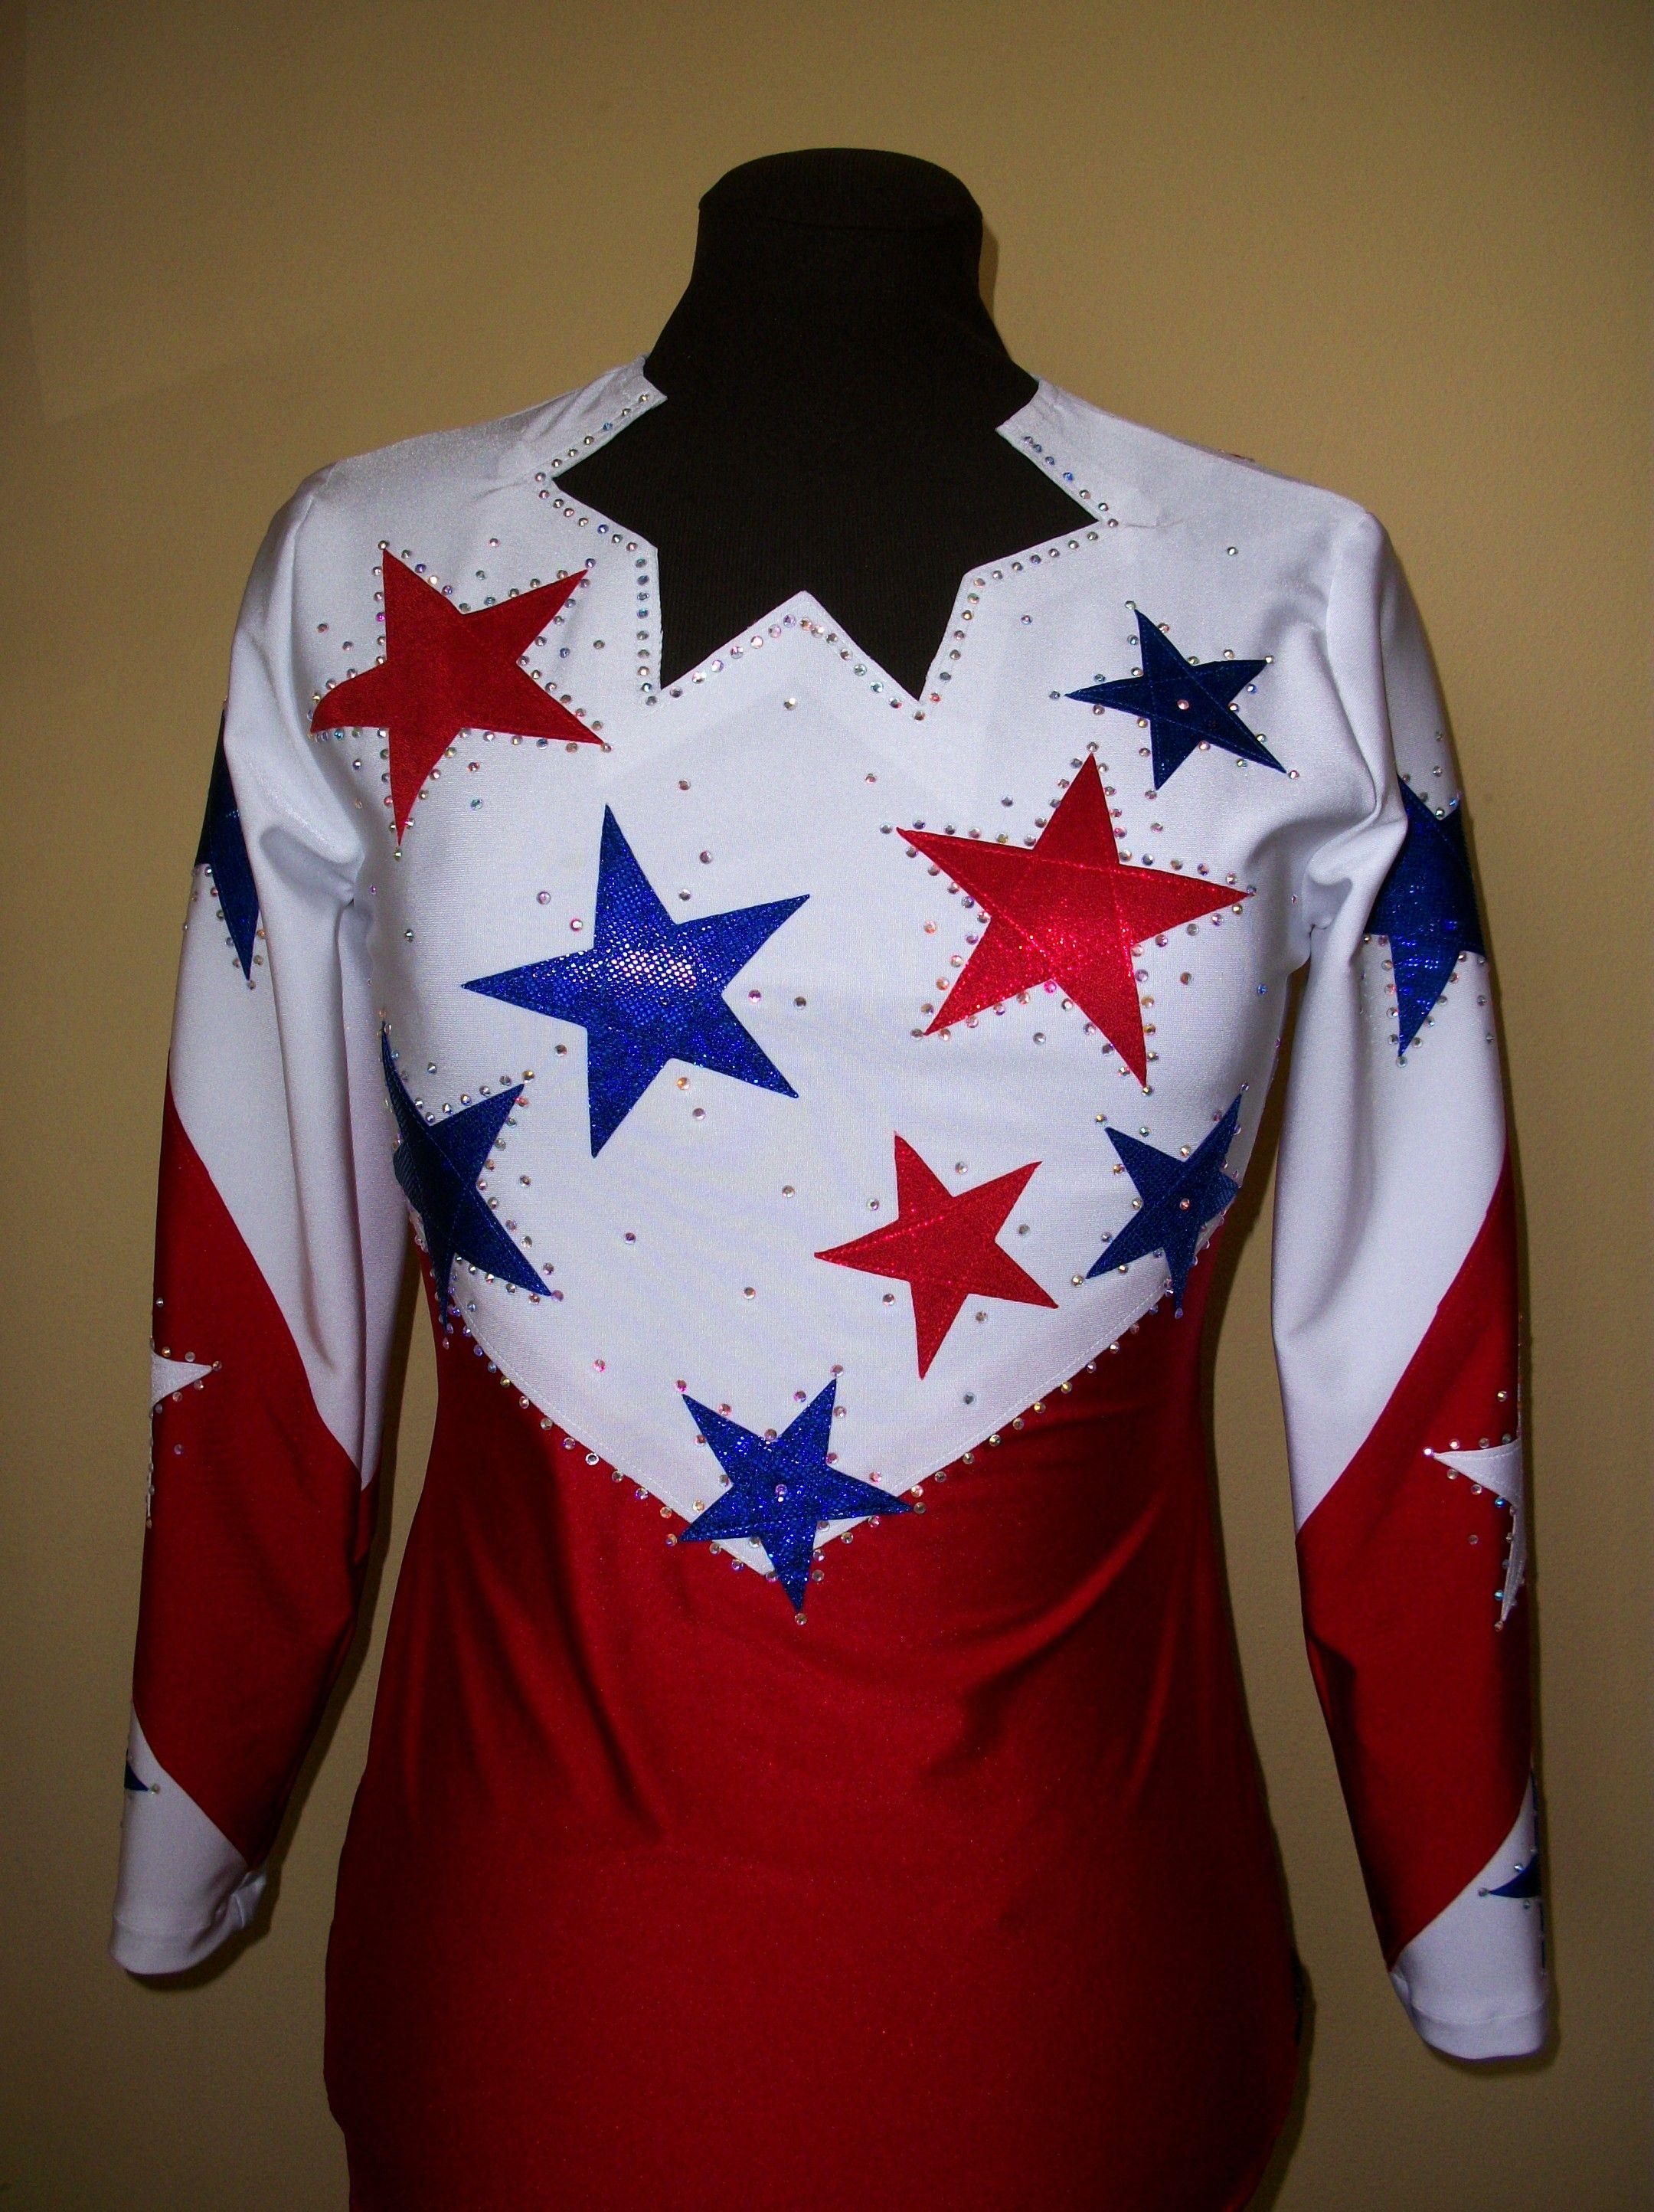 ce8e8d4e Custom Western Horse Show shirt, Rodeo Queen, jacket,clothes ...